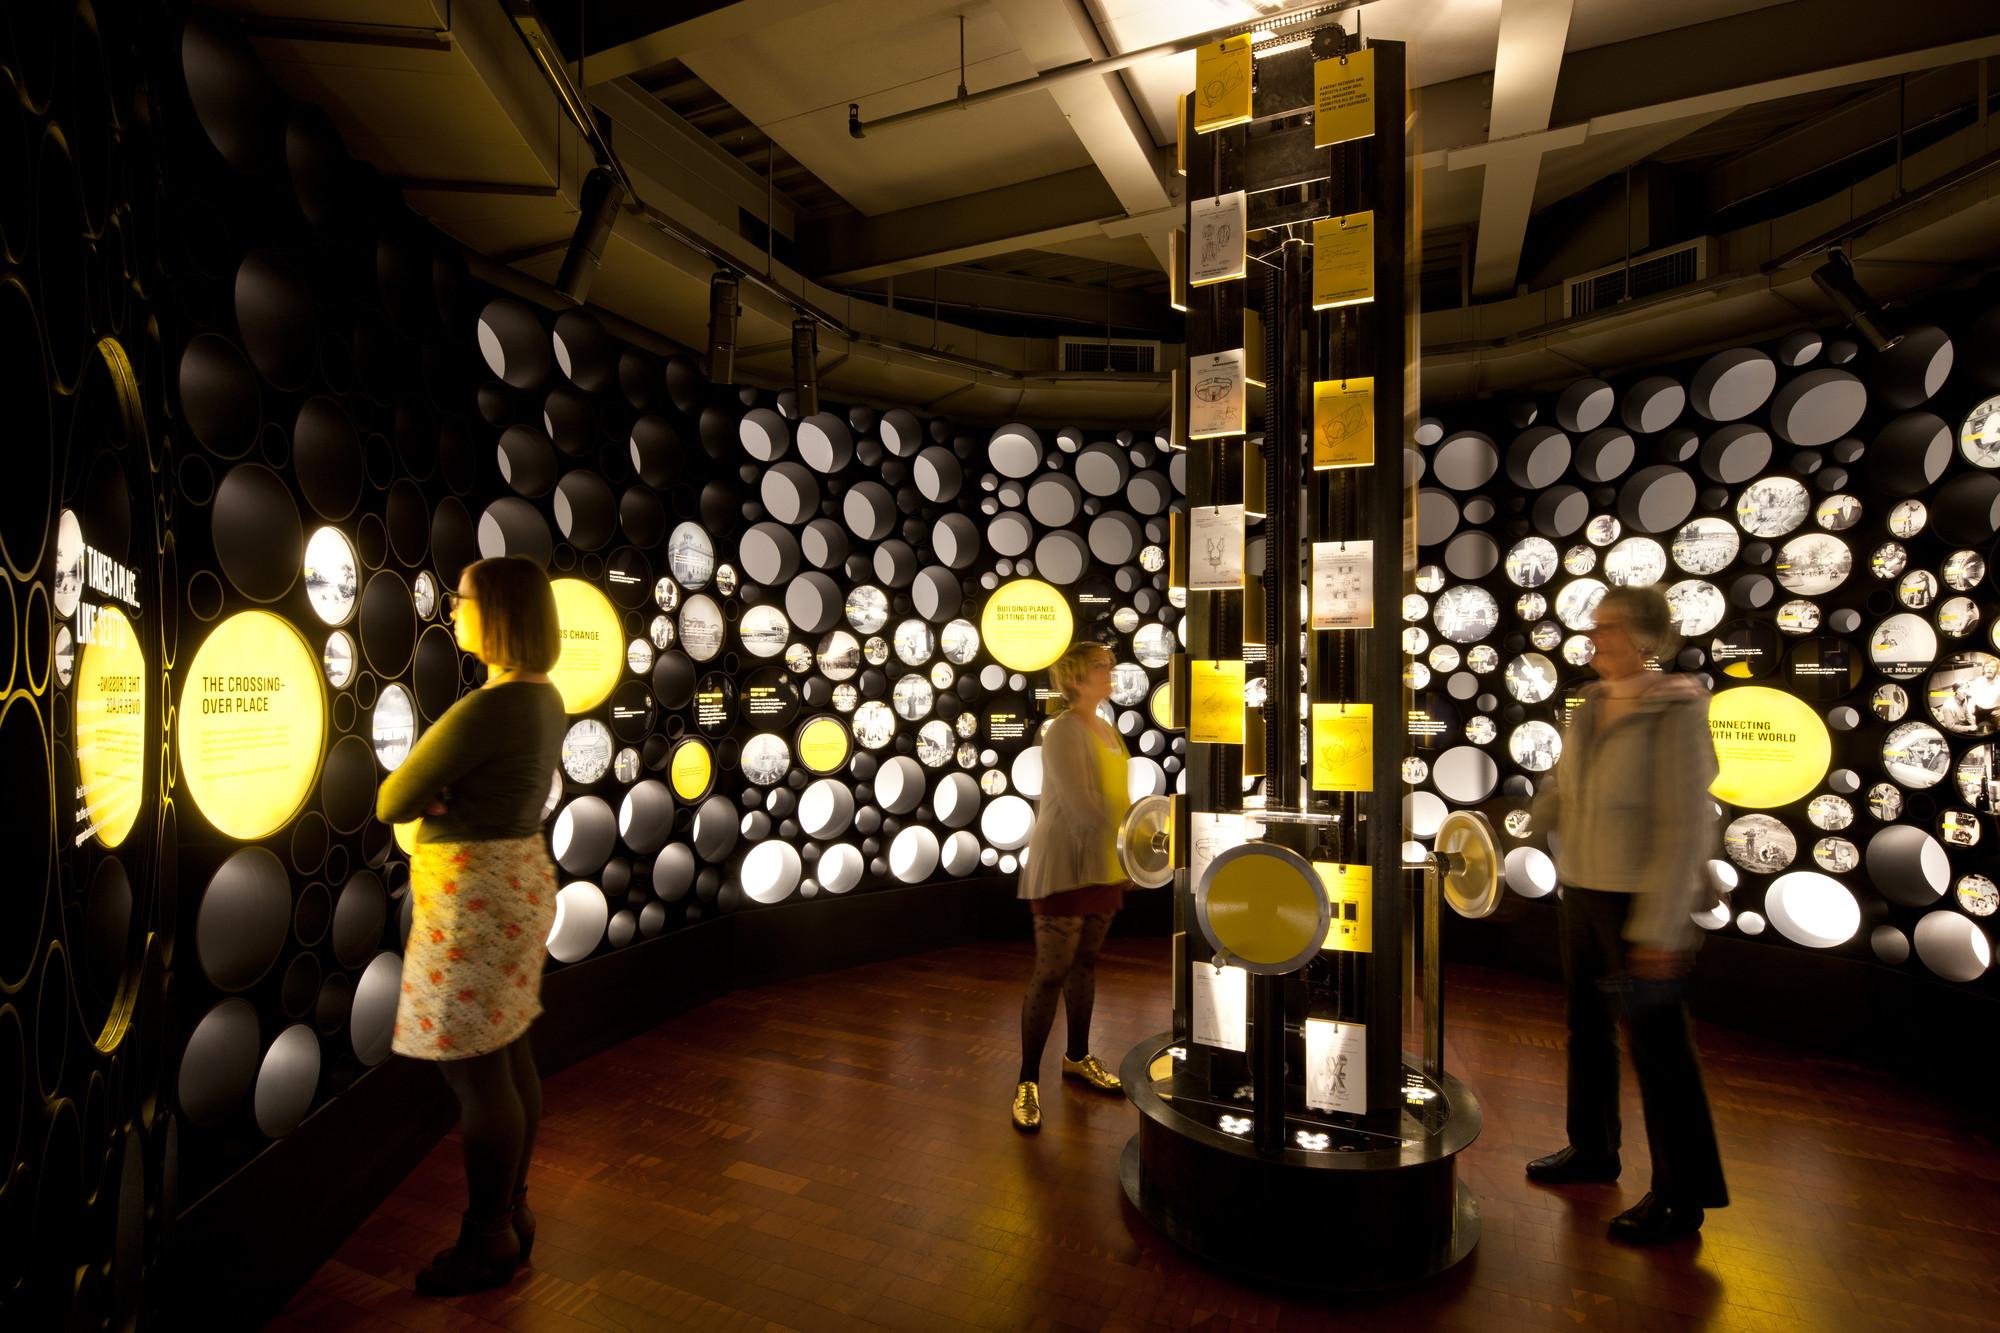 Bezos Center for Innovation / Olson Kundig Architects, © Lara Swimmer